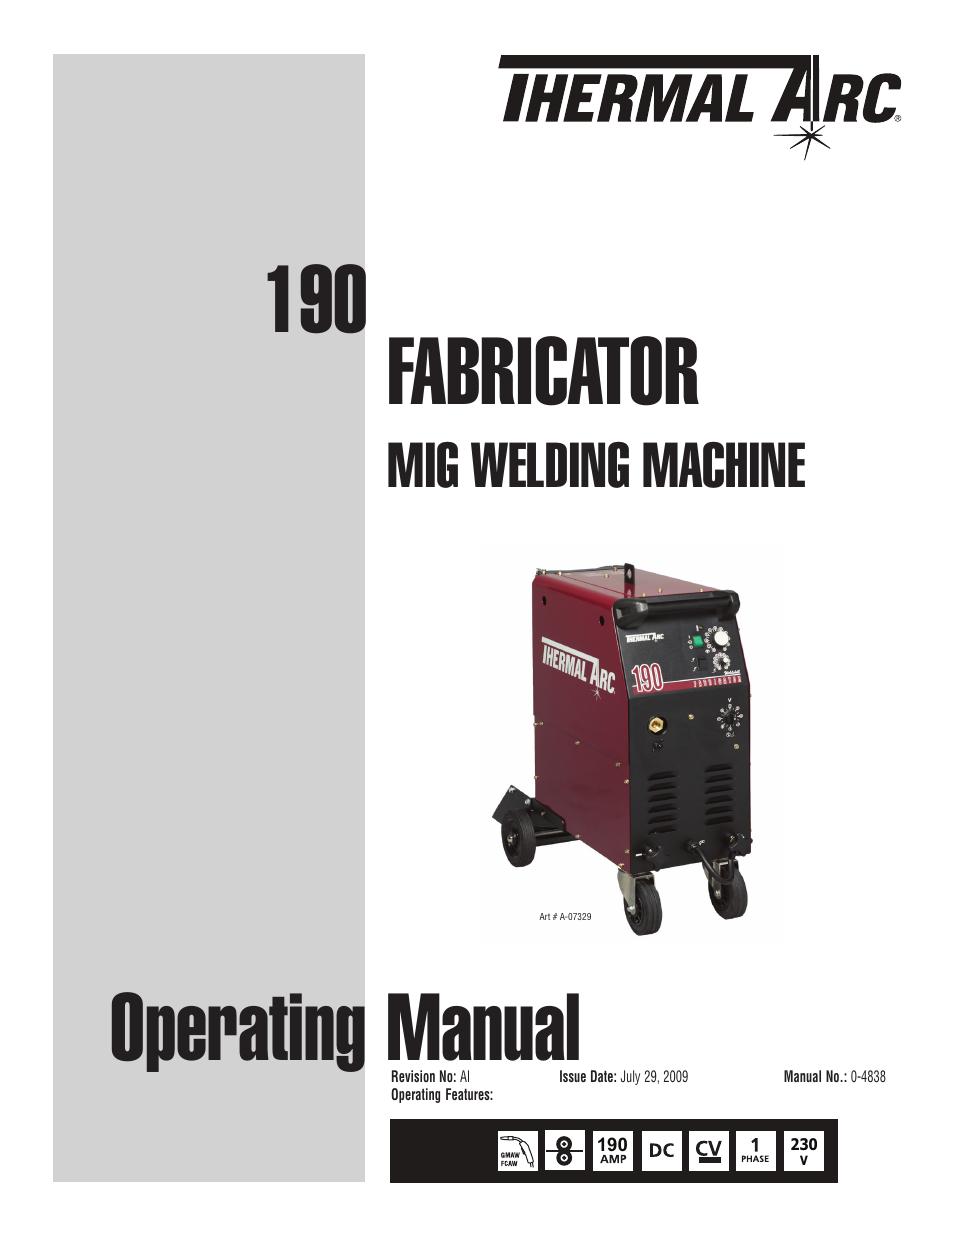 Hobart Fabricator Welder Wiring Diagram Find Century Mig Model 20511 Tweco 190 Thermal Arc User Manual 64 Pages Rh Manualsdir Com Schematics Lincoln